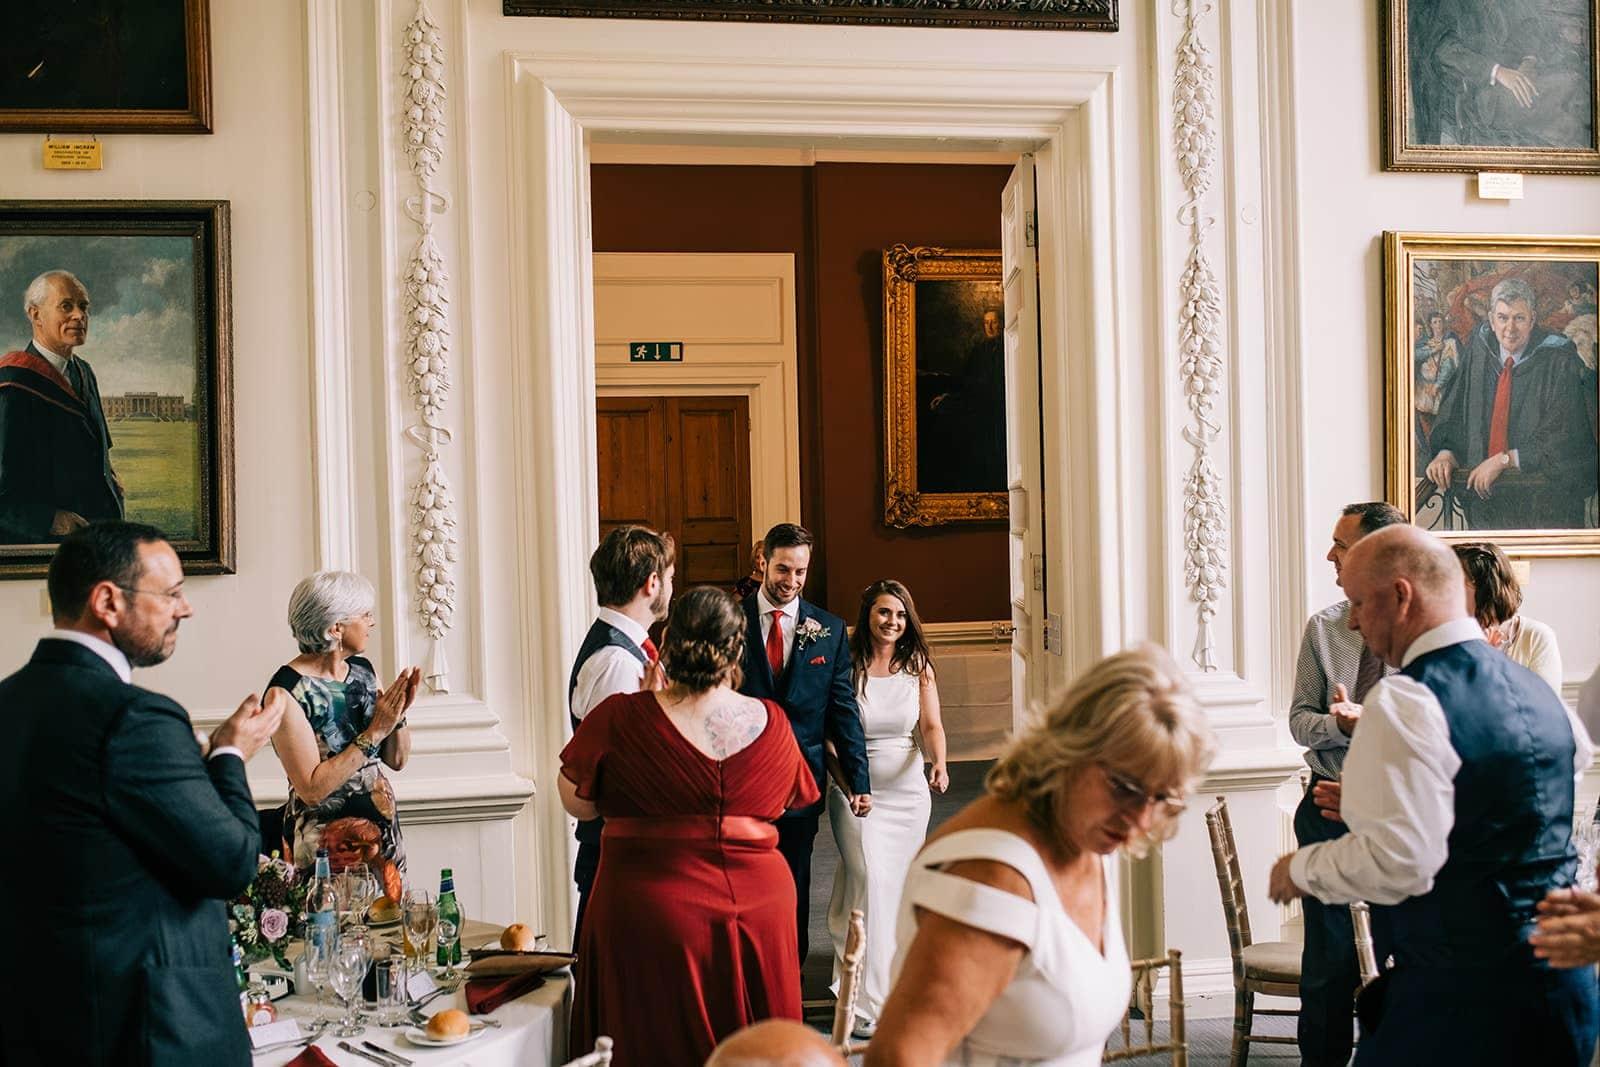 Yasmin and Leigh enter the wedding breakfast room